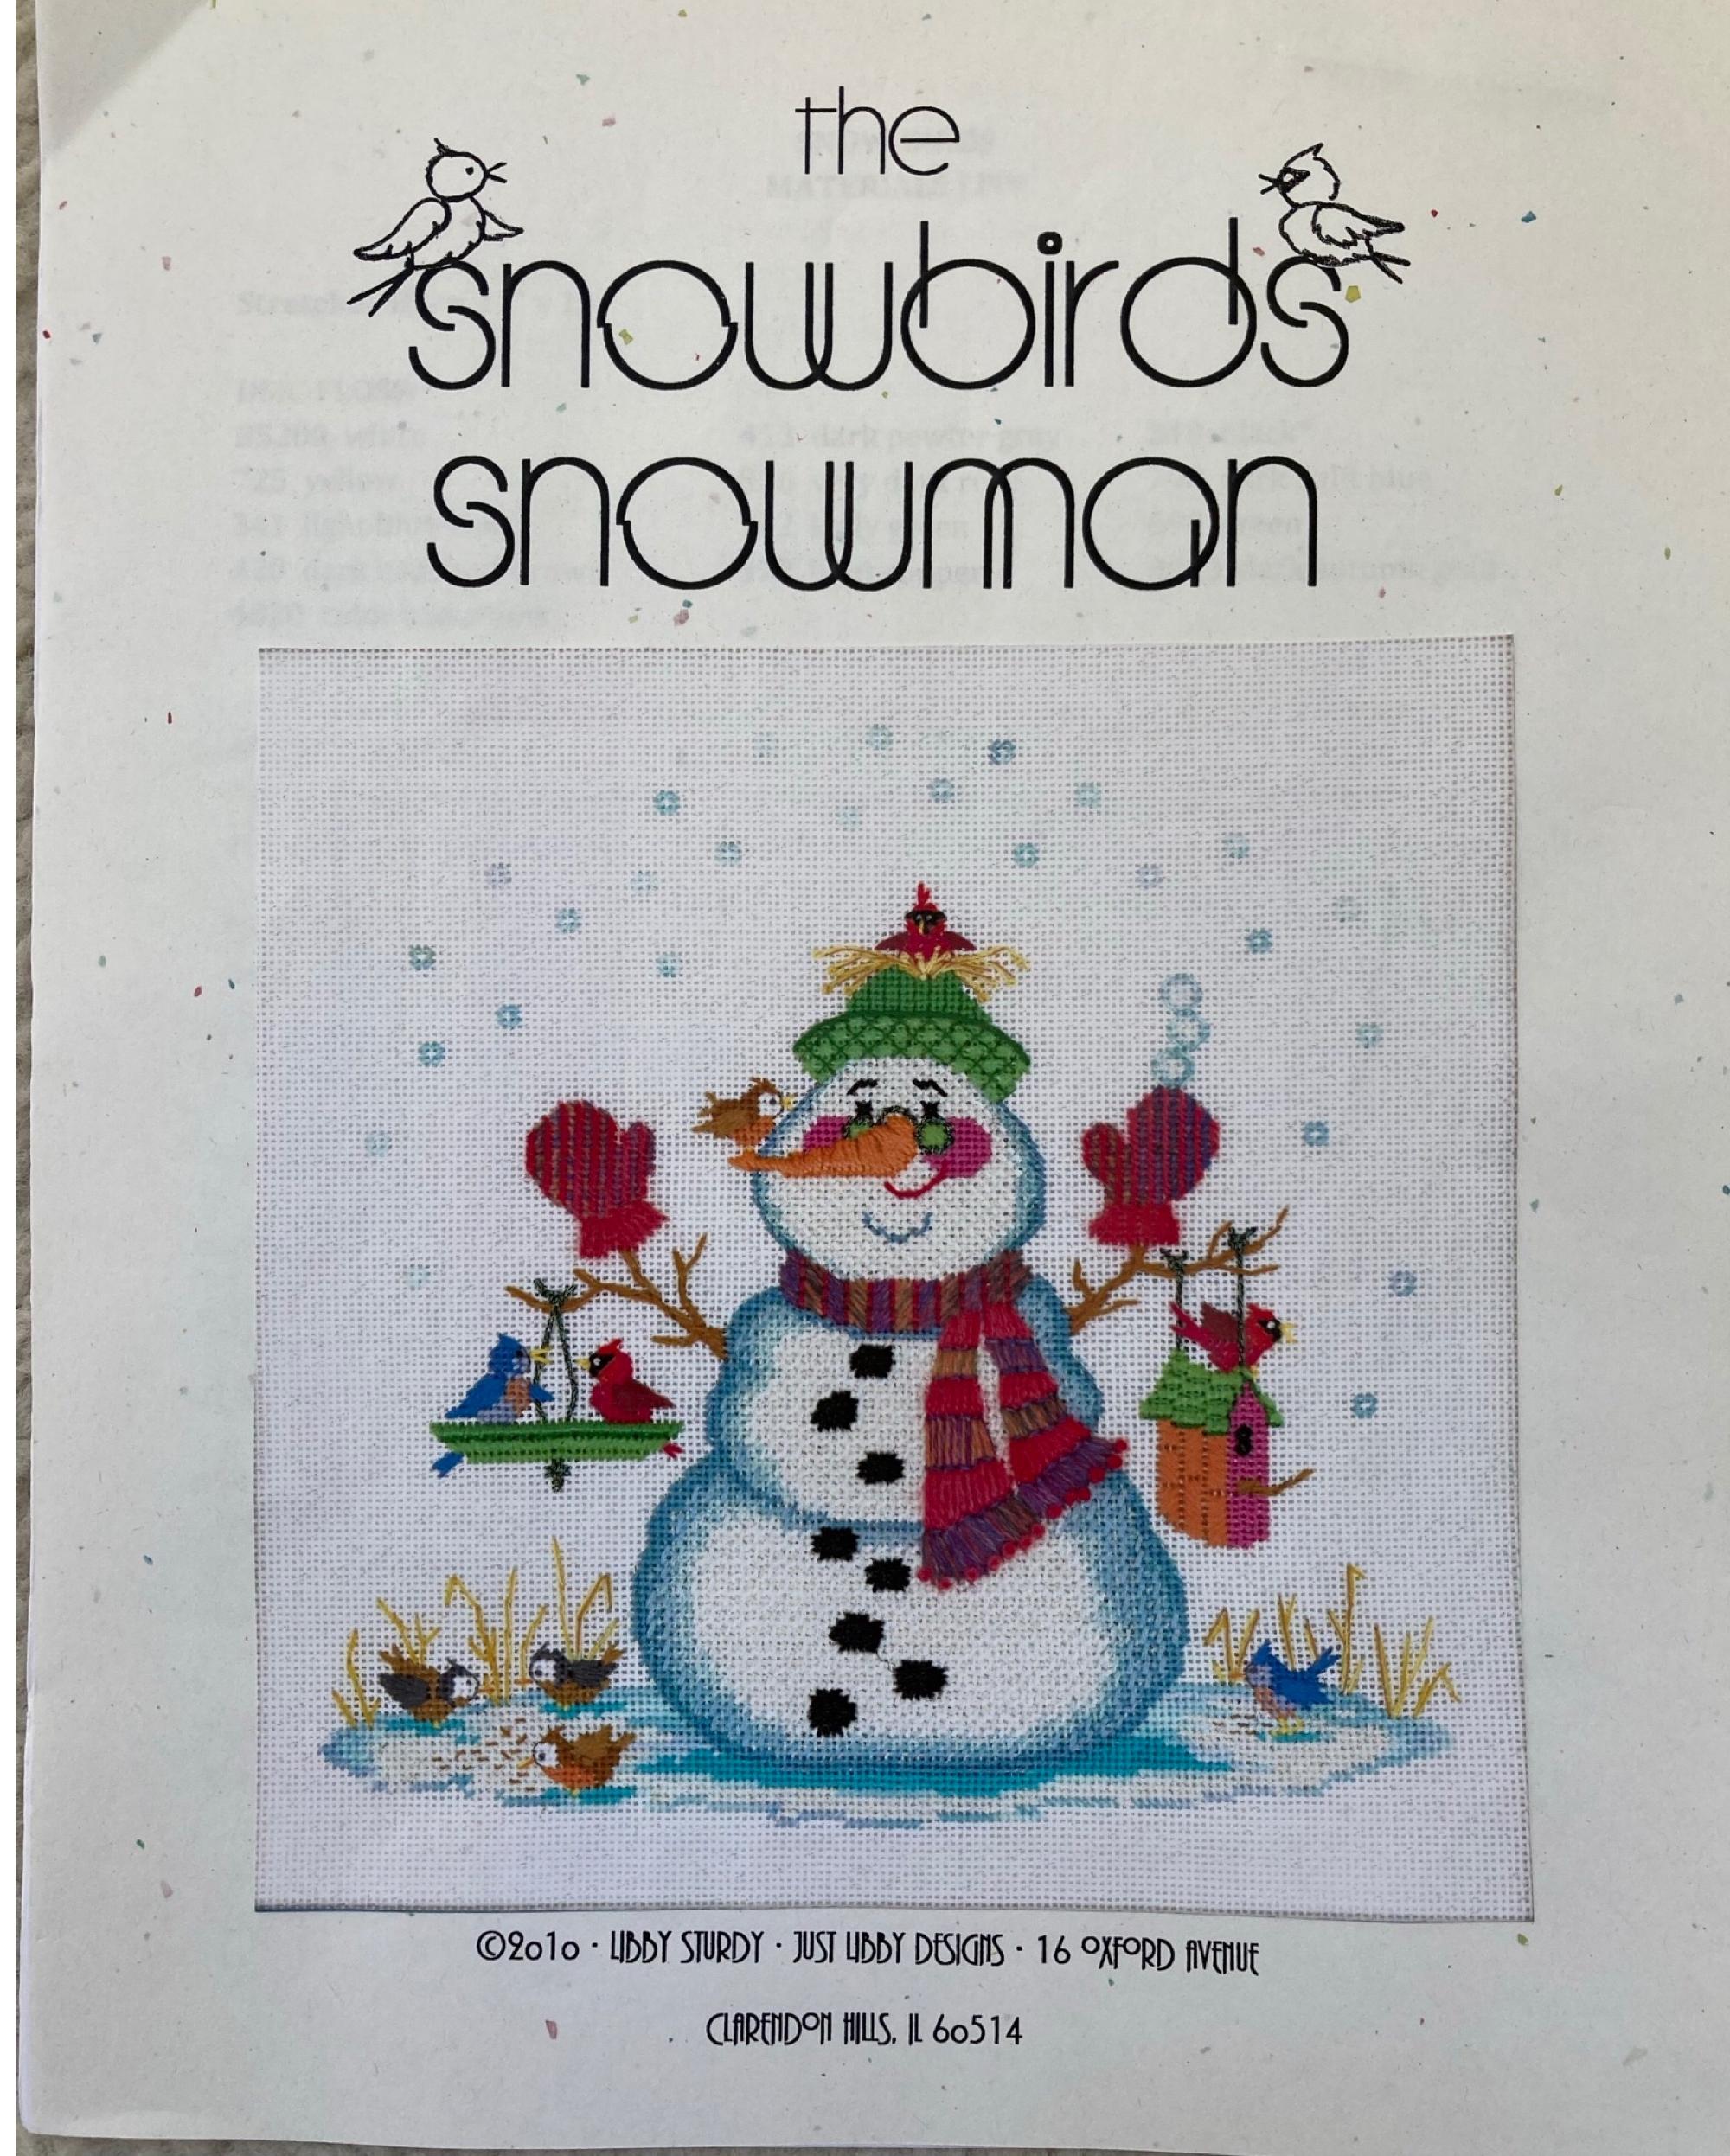 The Snowbirds Snowman